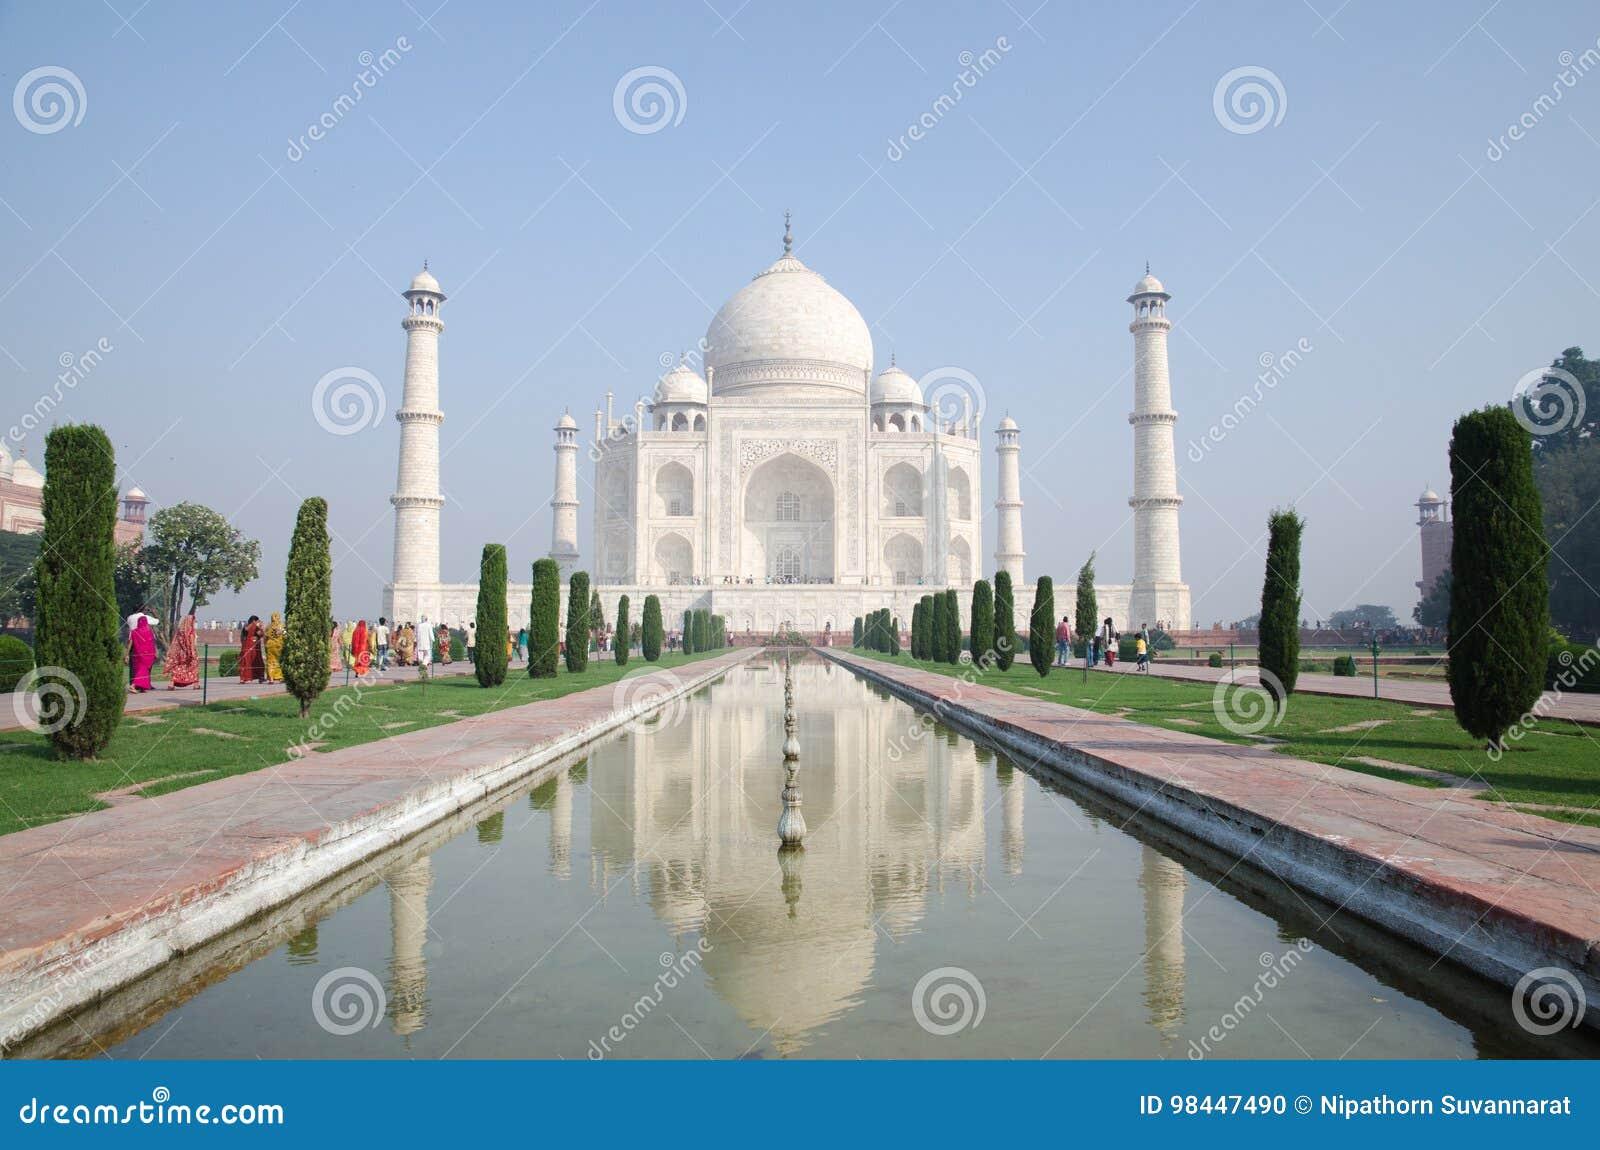 Origineel, Taj Mahal Seven Wonders Concept, India,